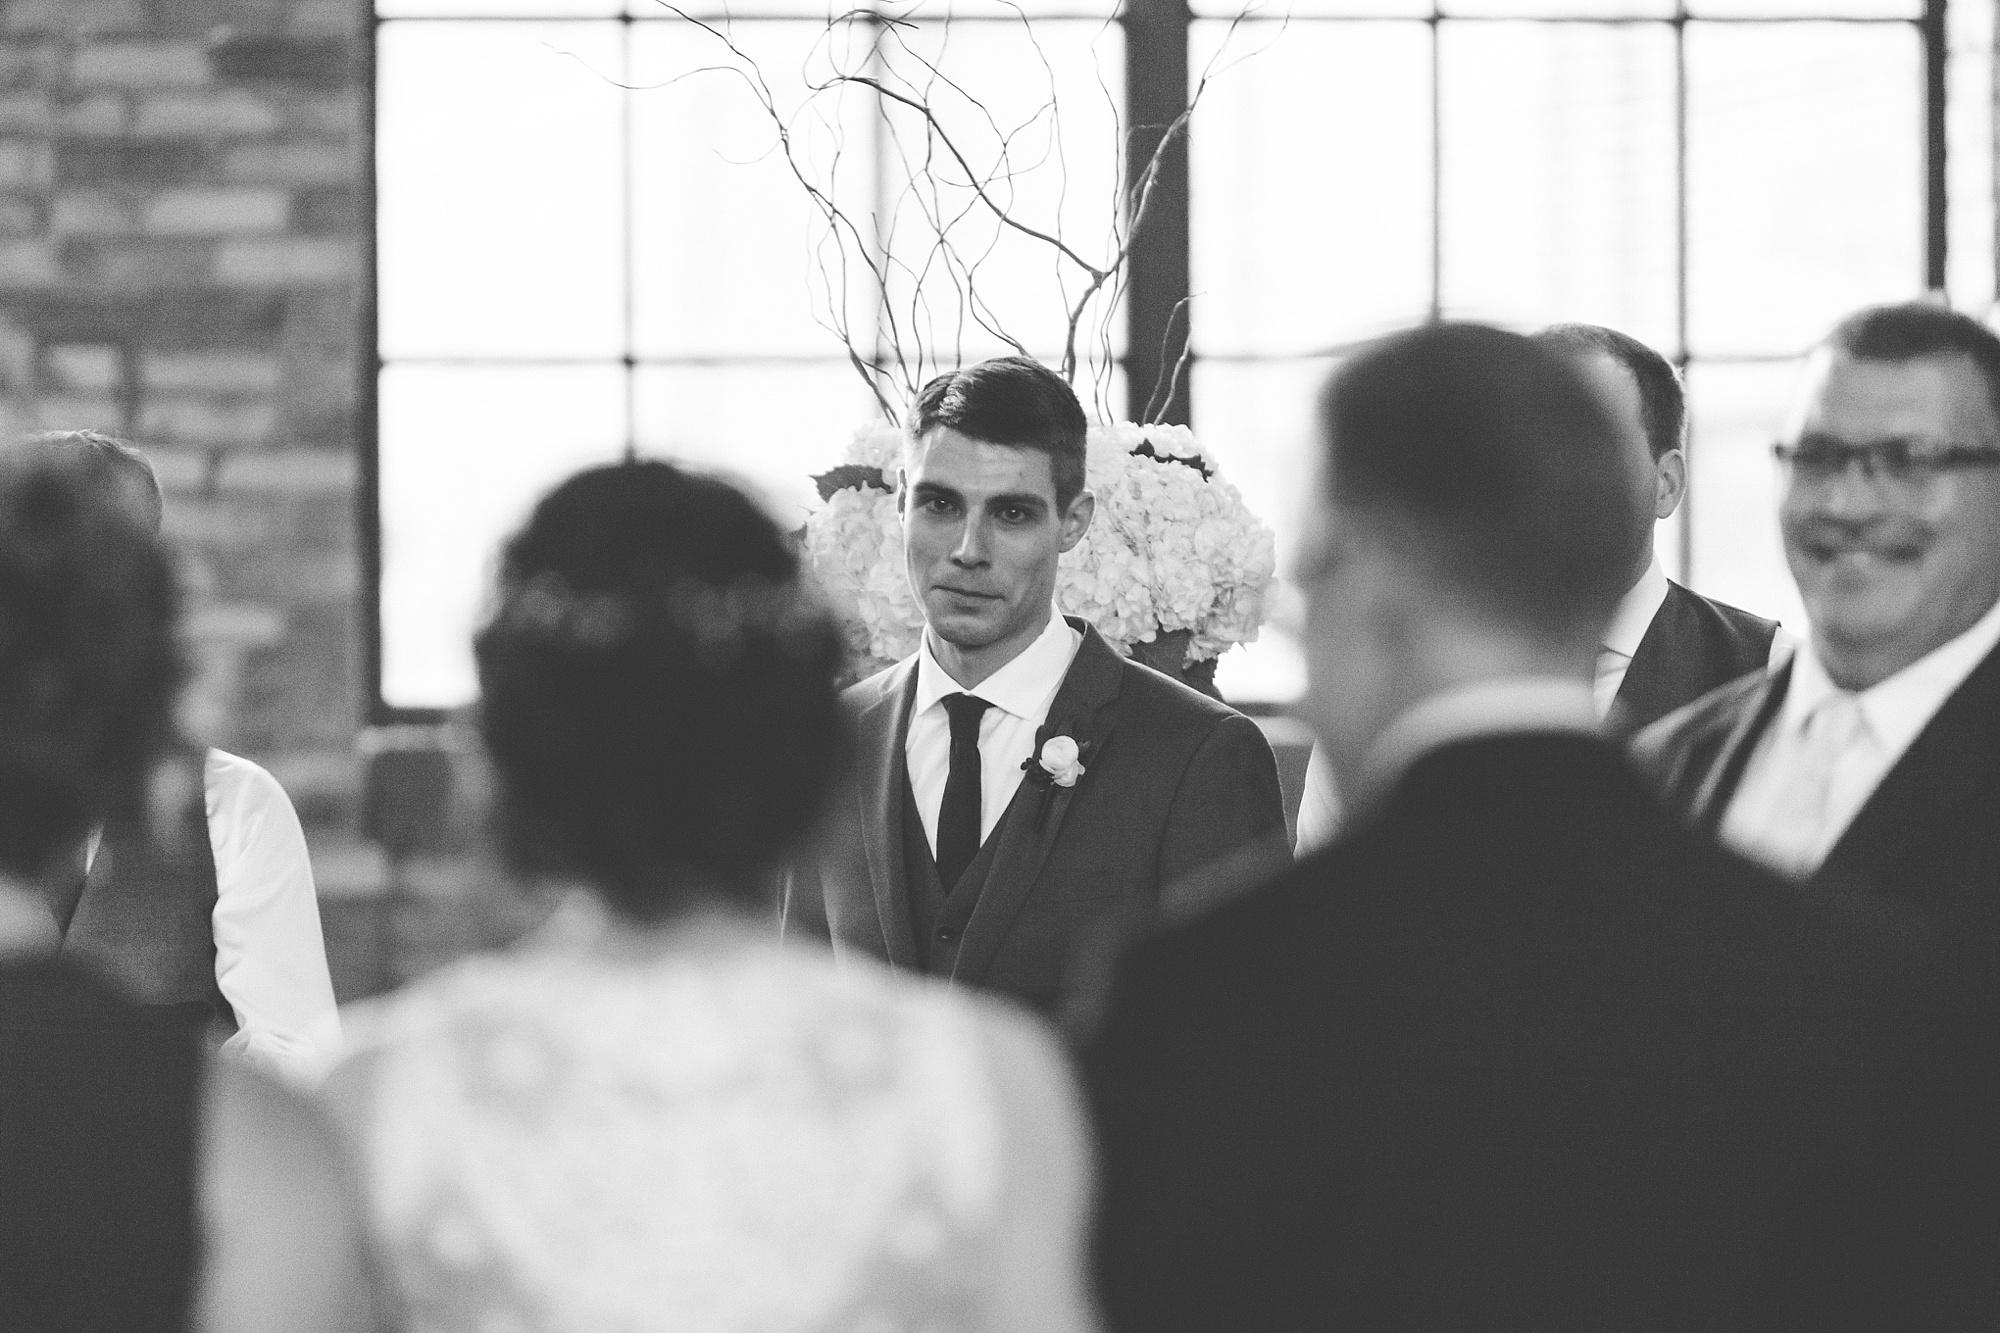 Brandon_Shafer_Photography_Lauren_Ethan_New_Vintage_Place_Grand_Rapids_Wedding_0033.jpg